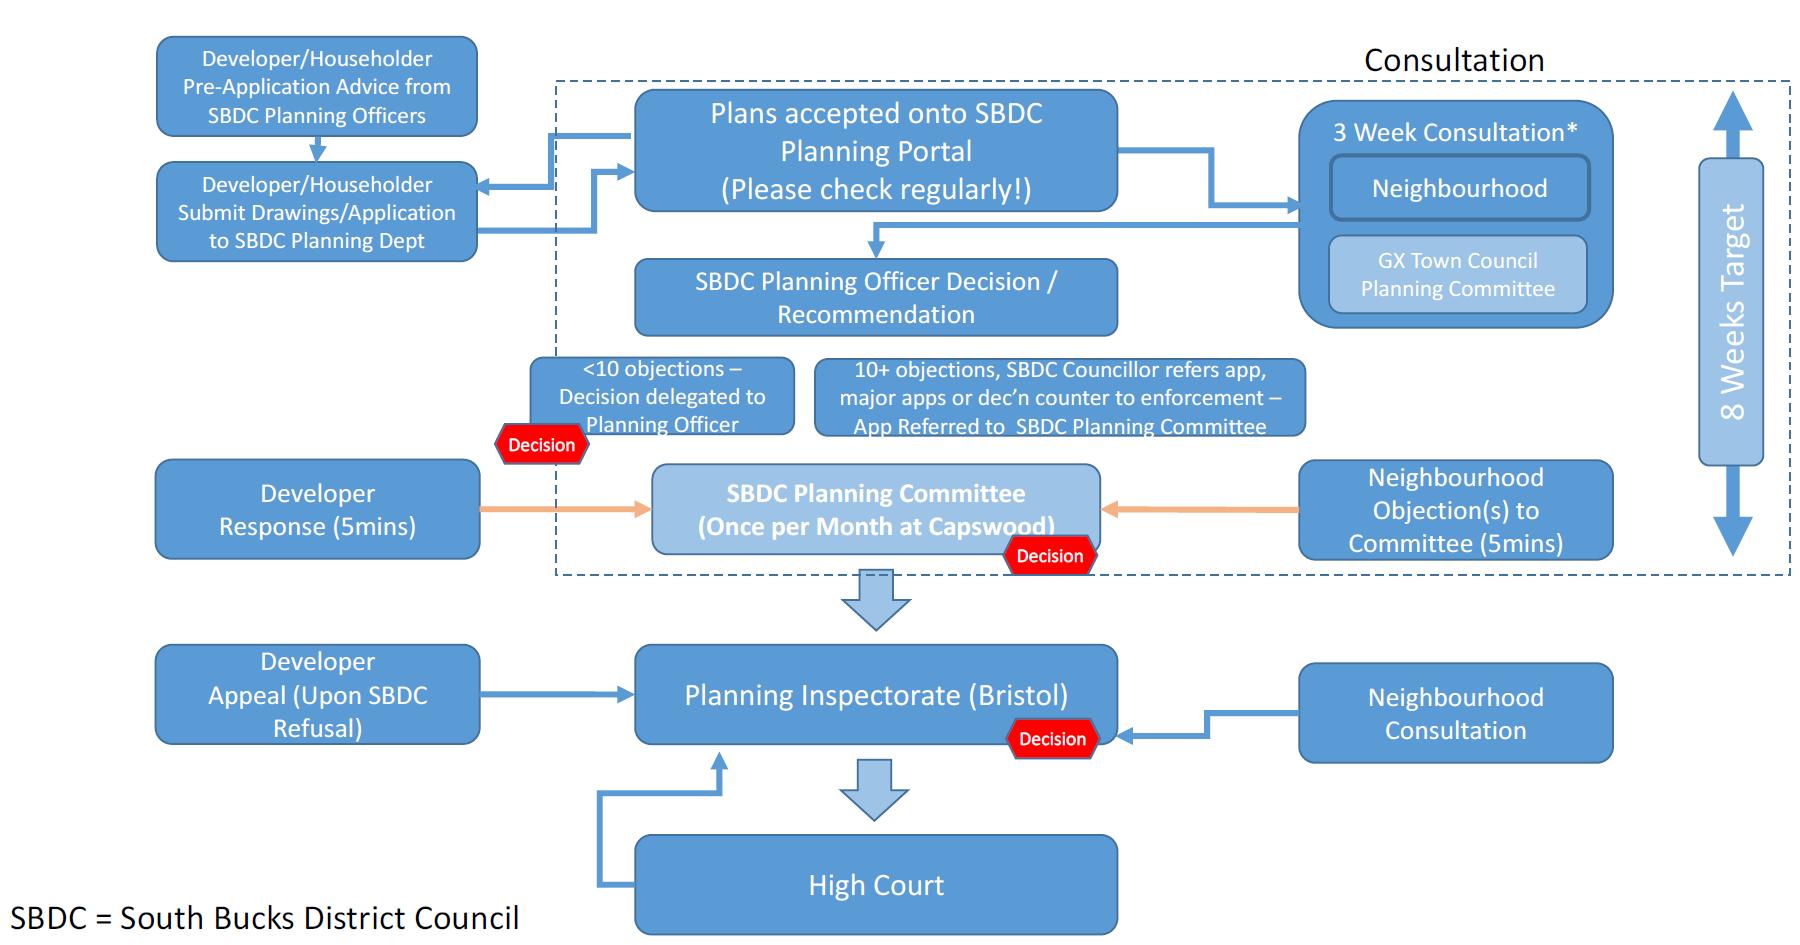 The Planning Process Block Diagram